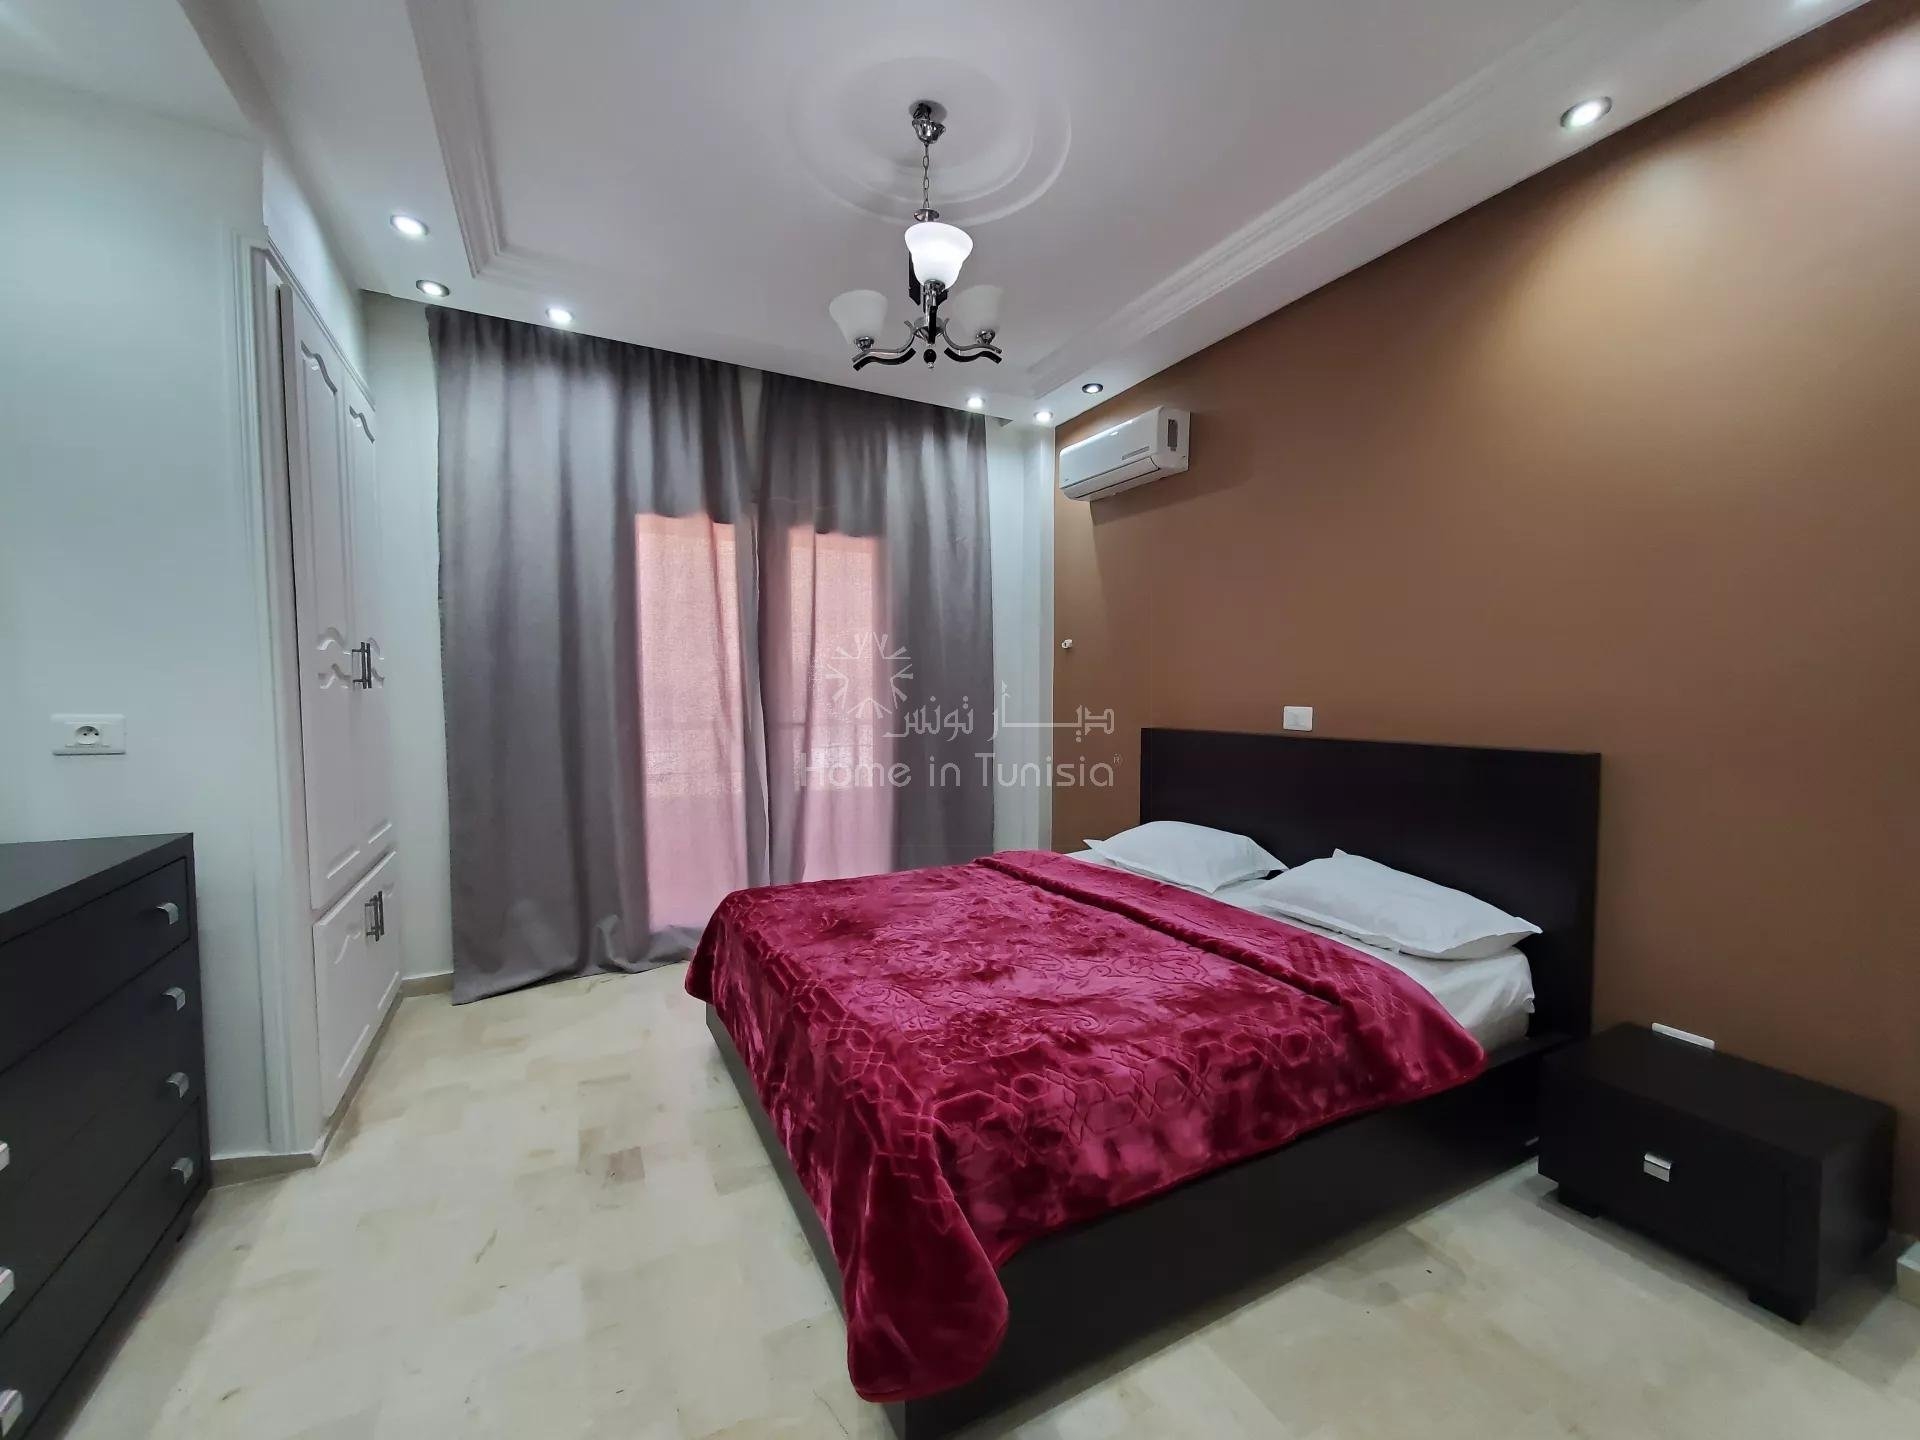 Location Appartement - Sousse - Tunisie